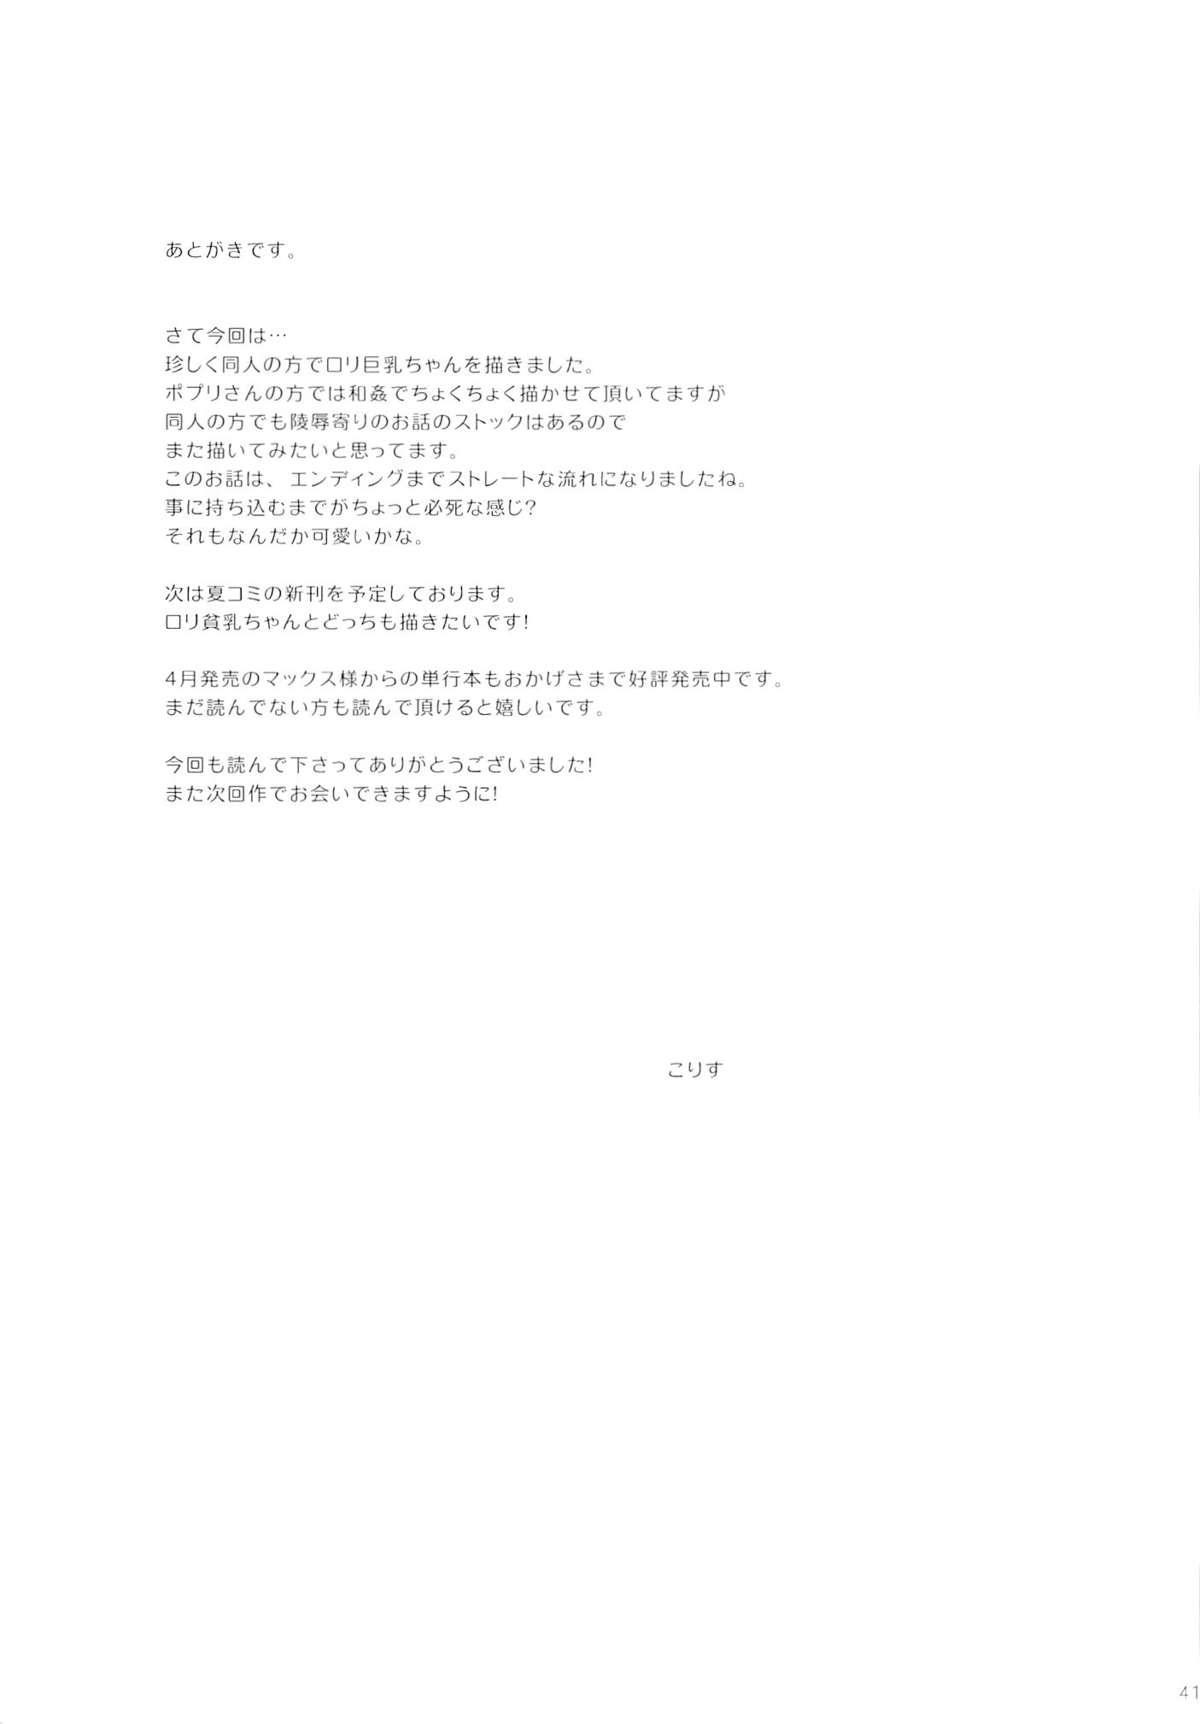 Itoko Mio Hajimete no... 40